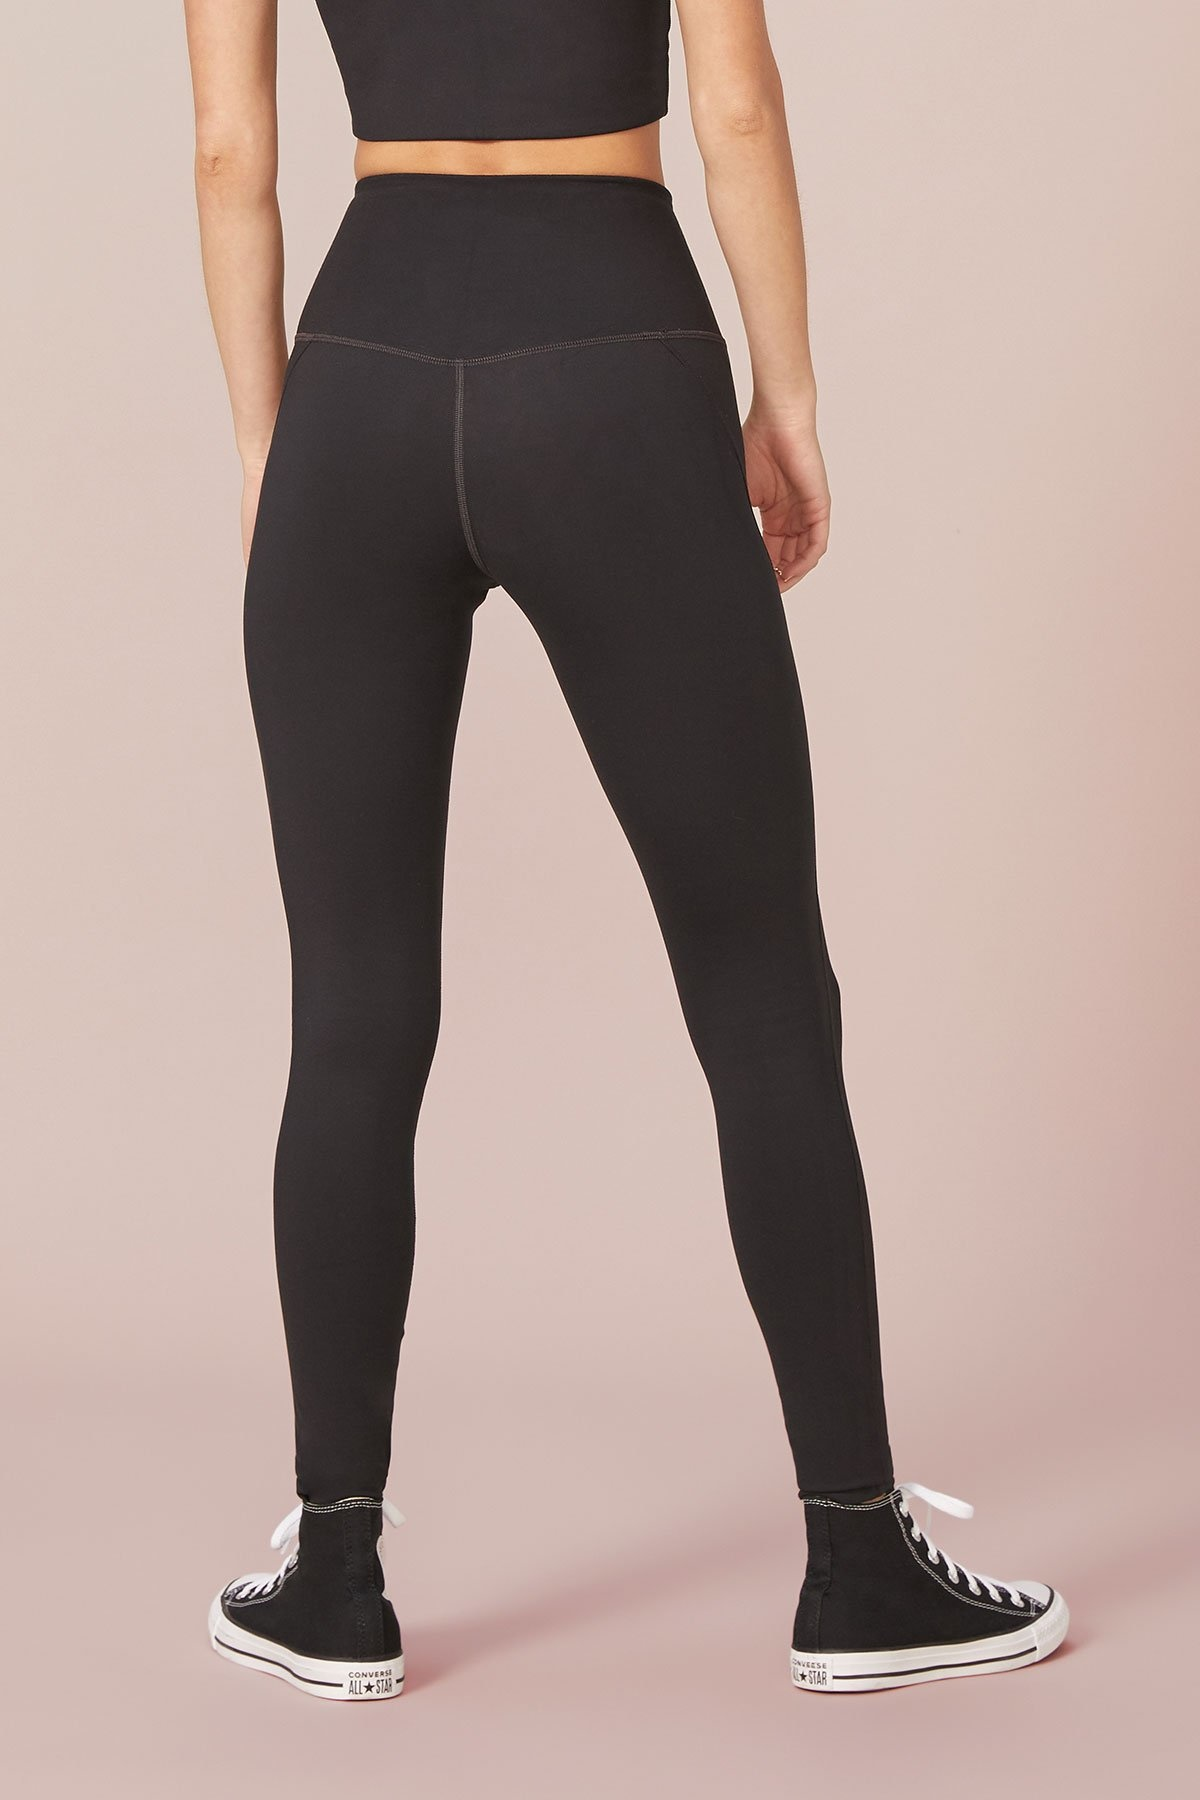 Girlfriend Collective   Compressive high-rise legging zwart-4